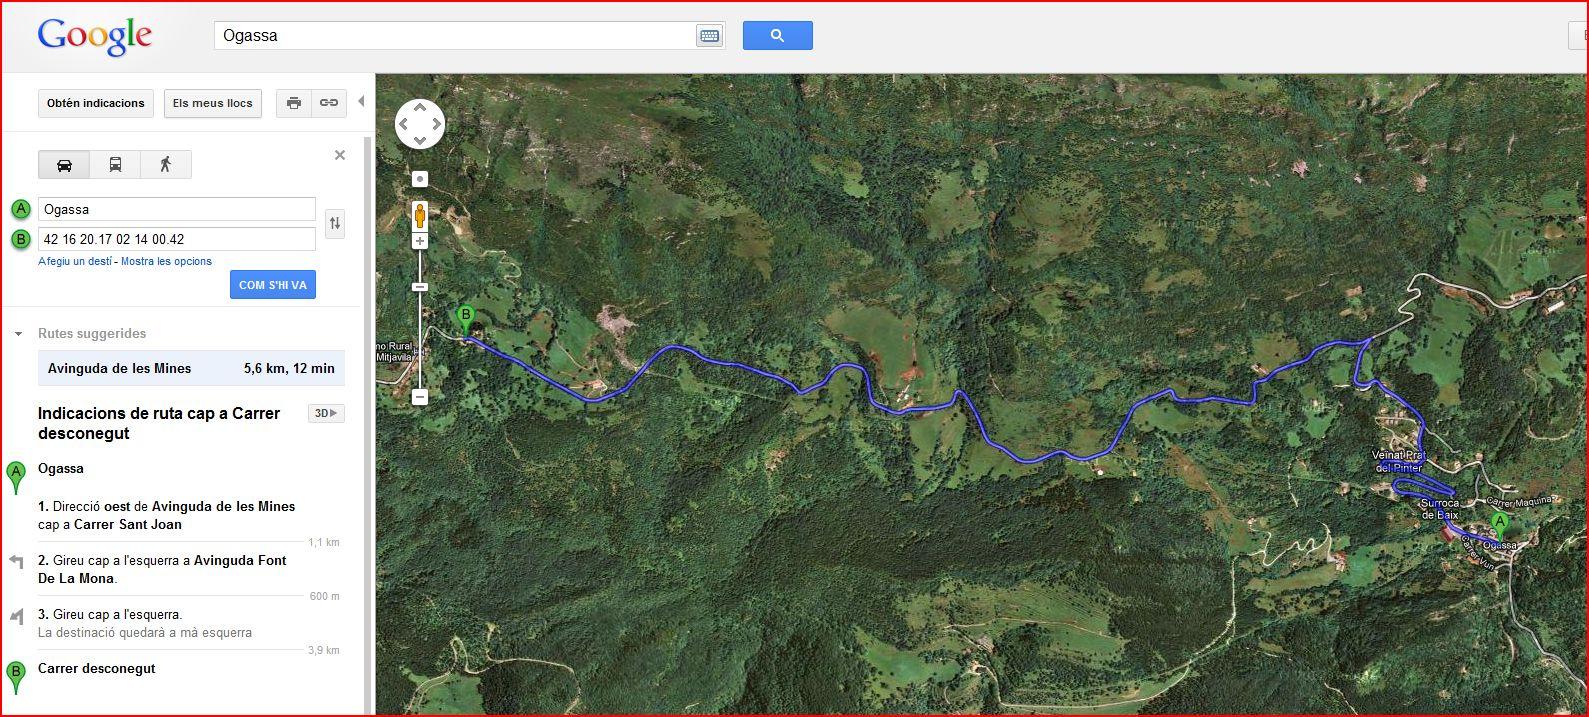 esglesia-de-st-marti-d-ogassa-itinerari-google-maps